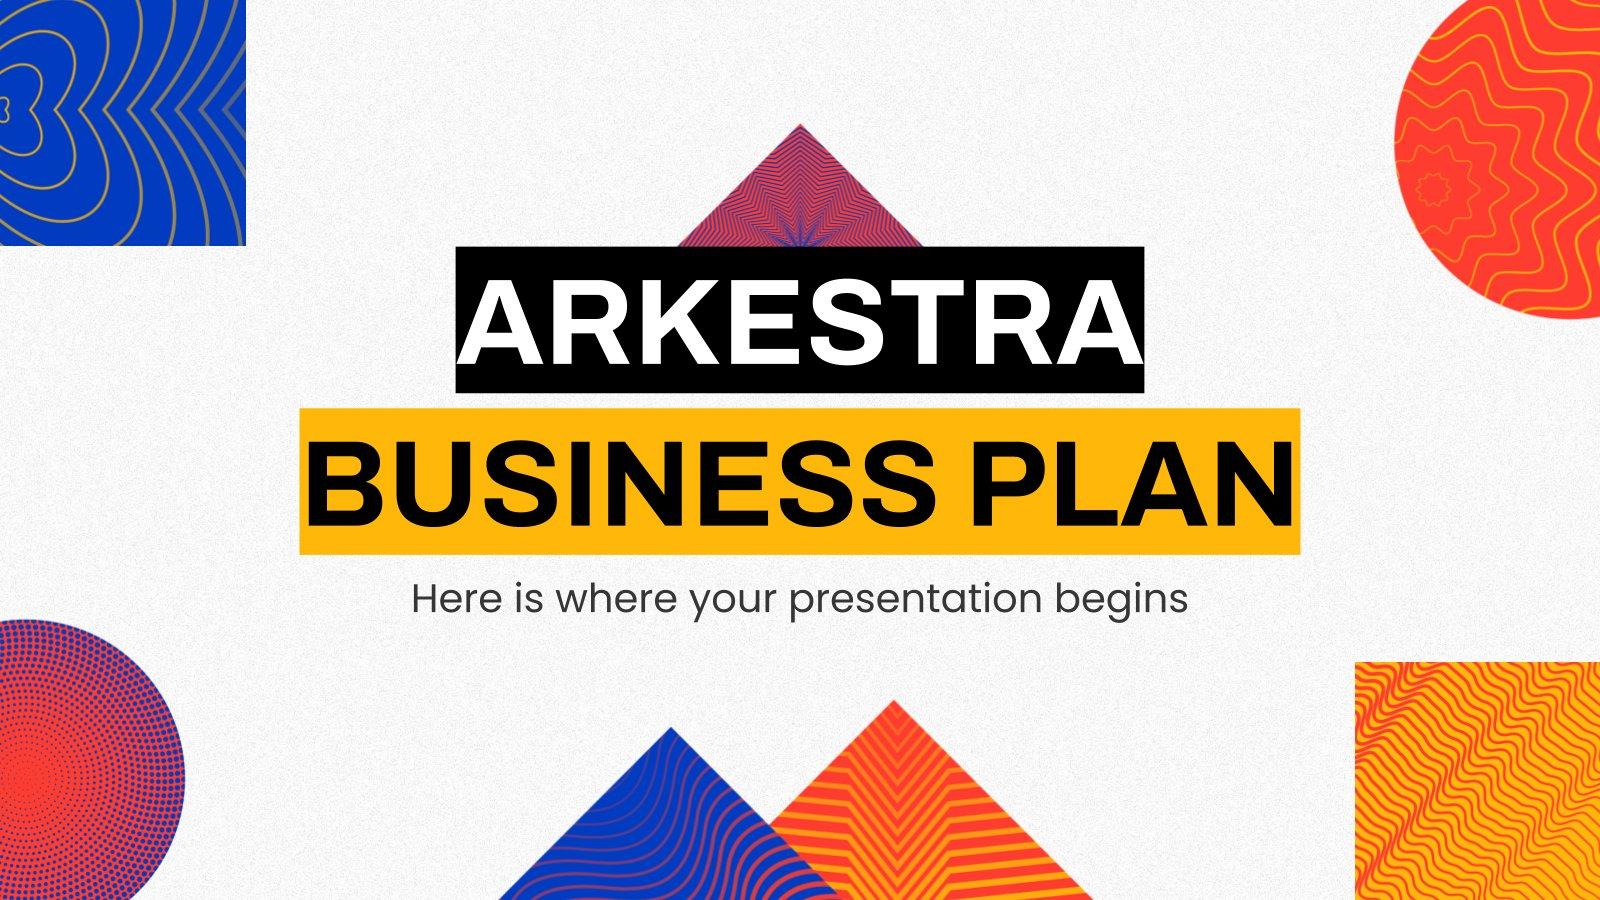 Arkestra Business Plan presentation template